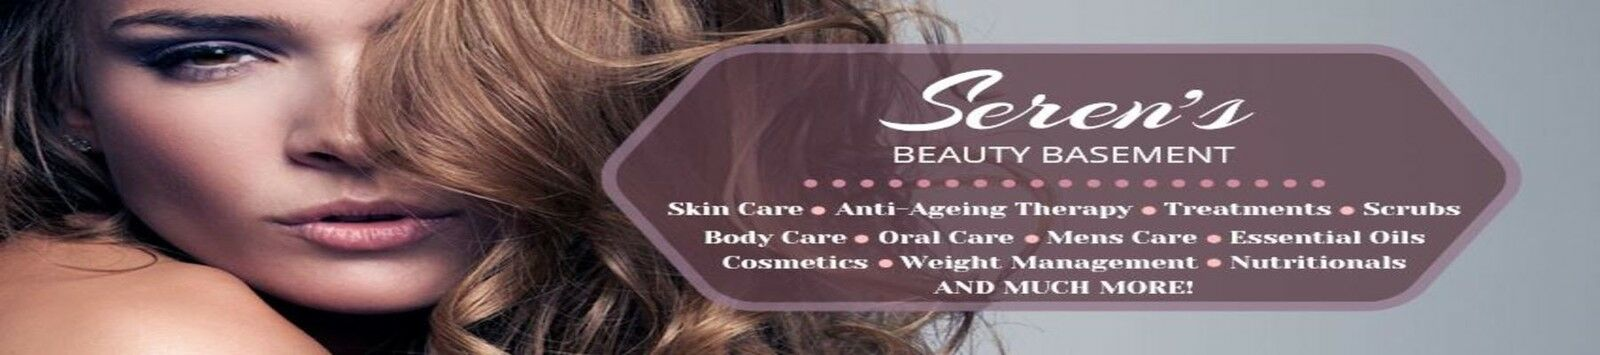 BeautyBasement_AU